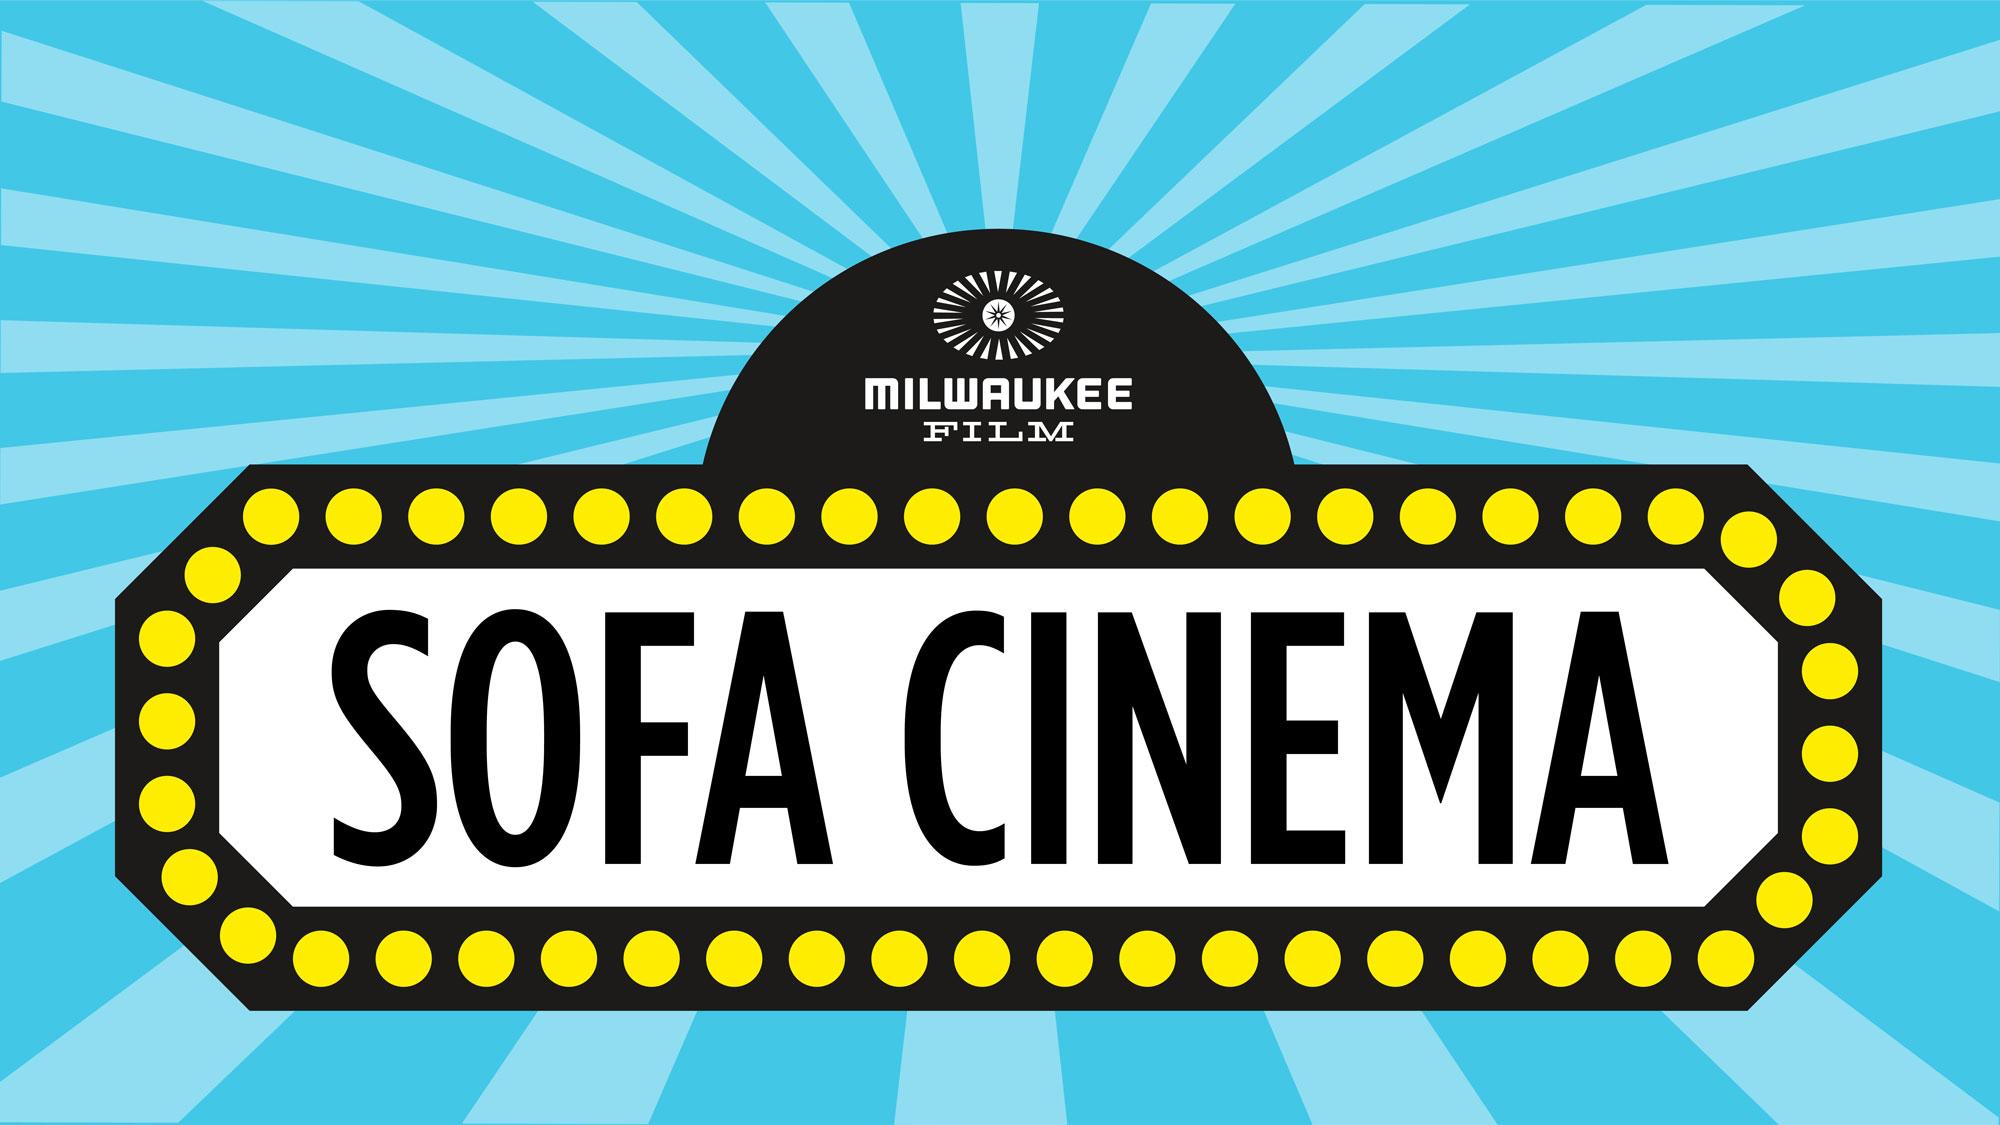 Milwaukee Film S Sofa Cinema